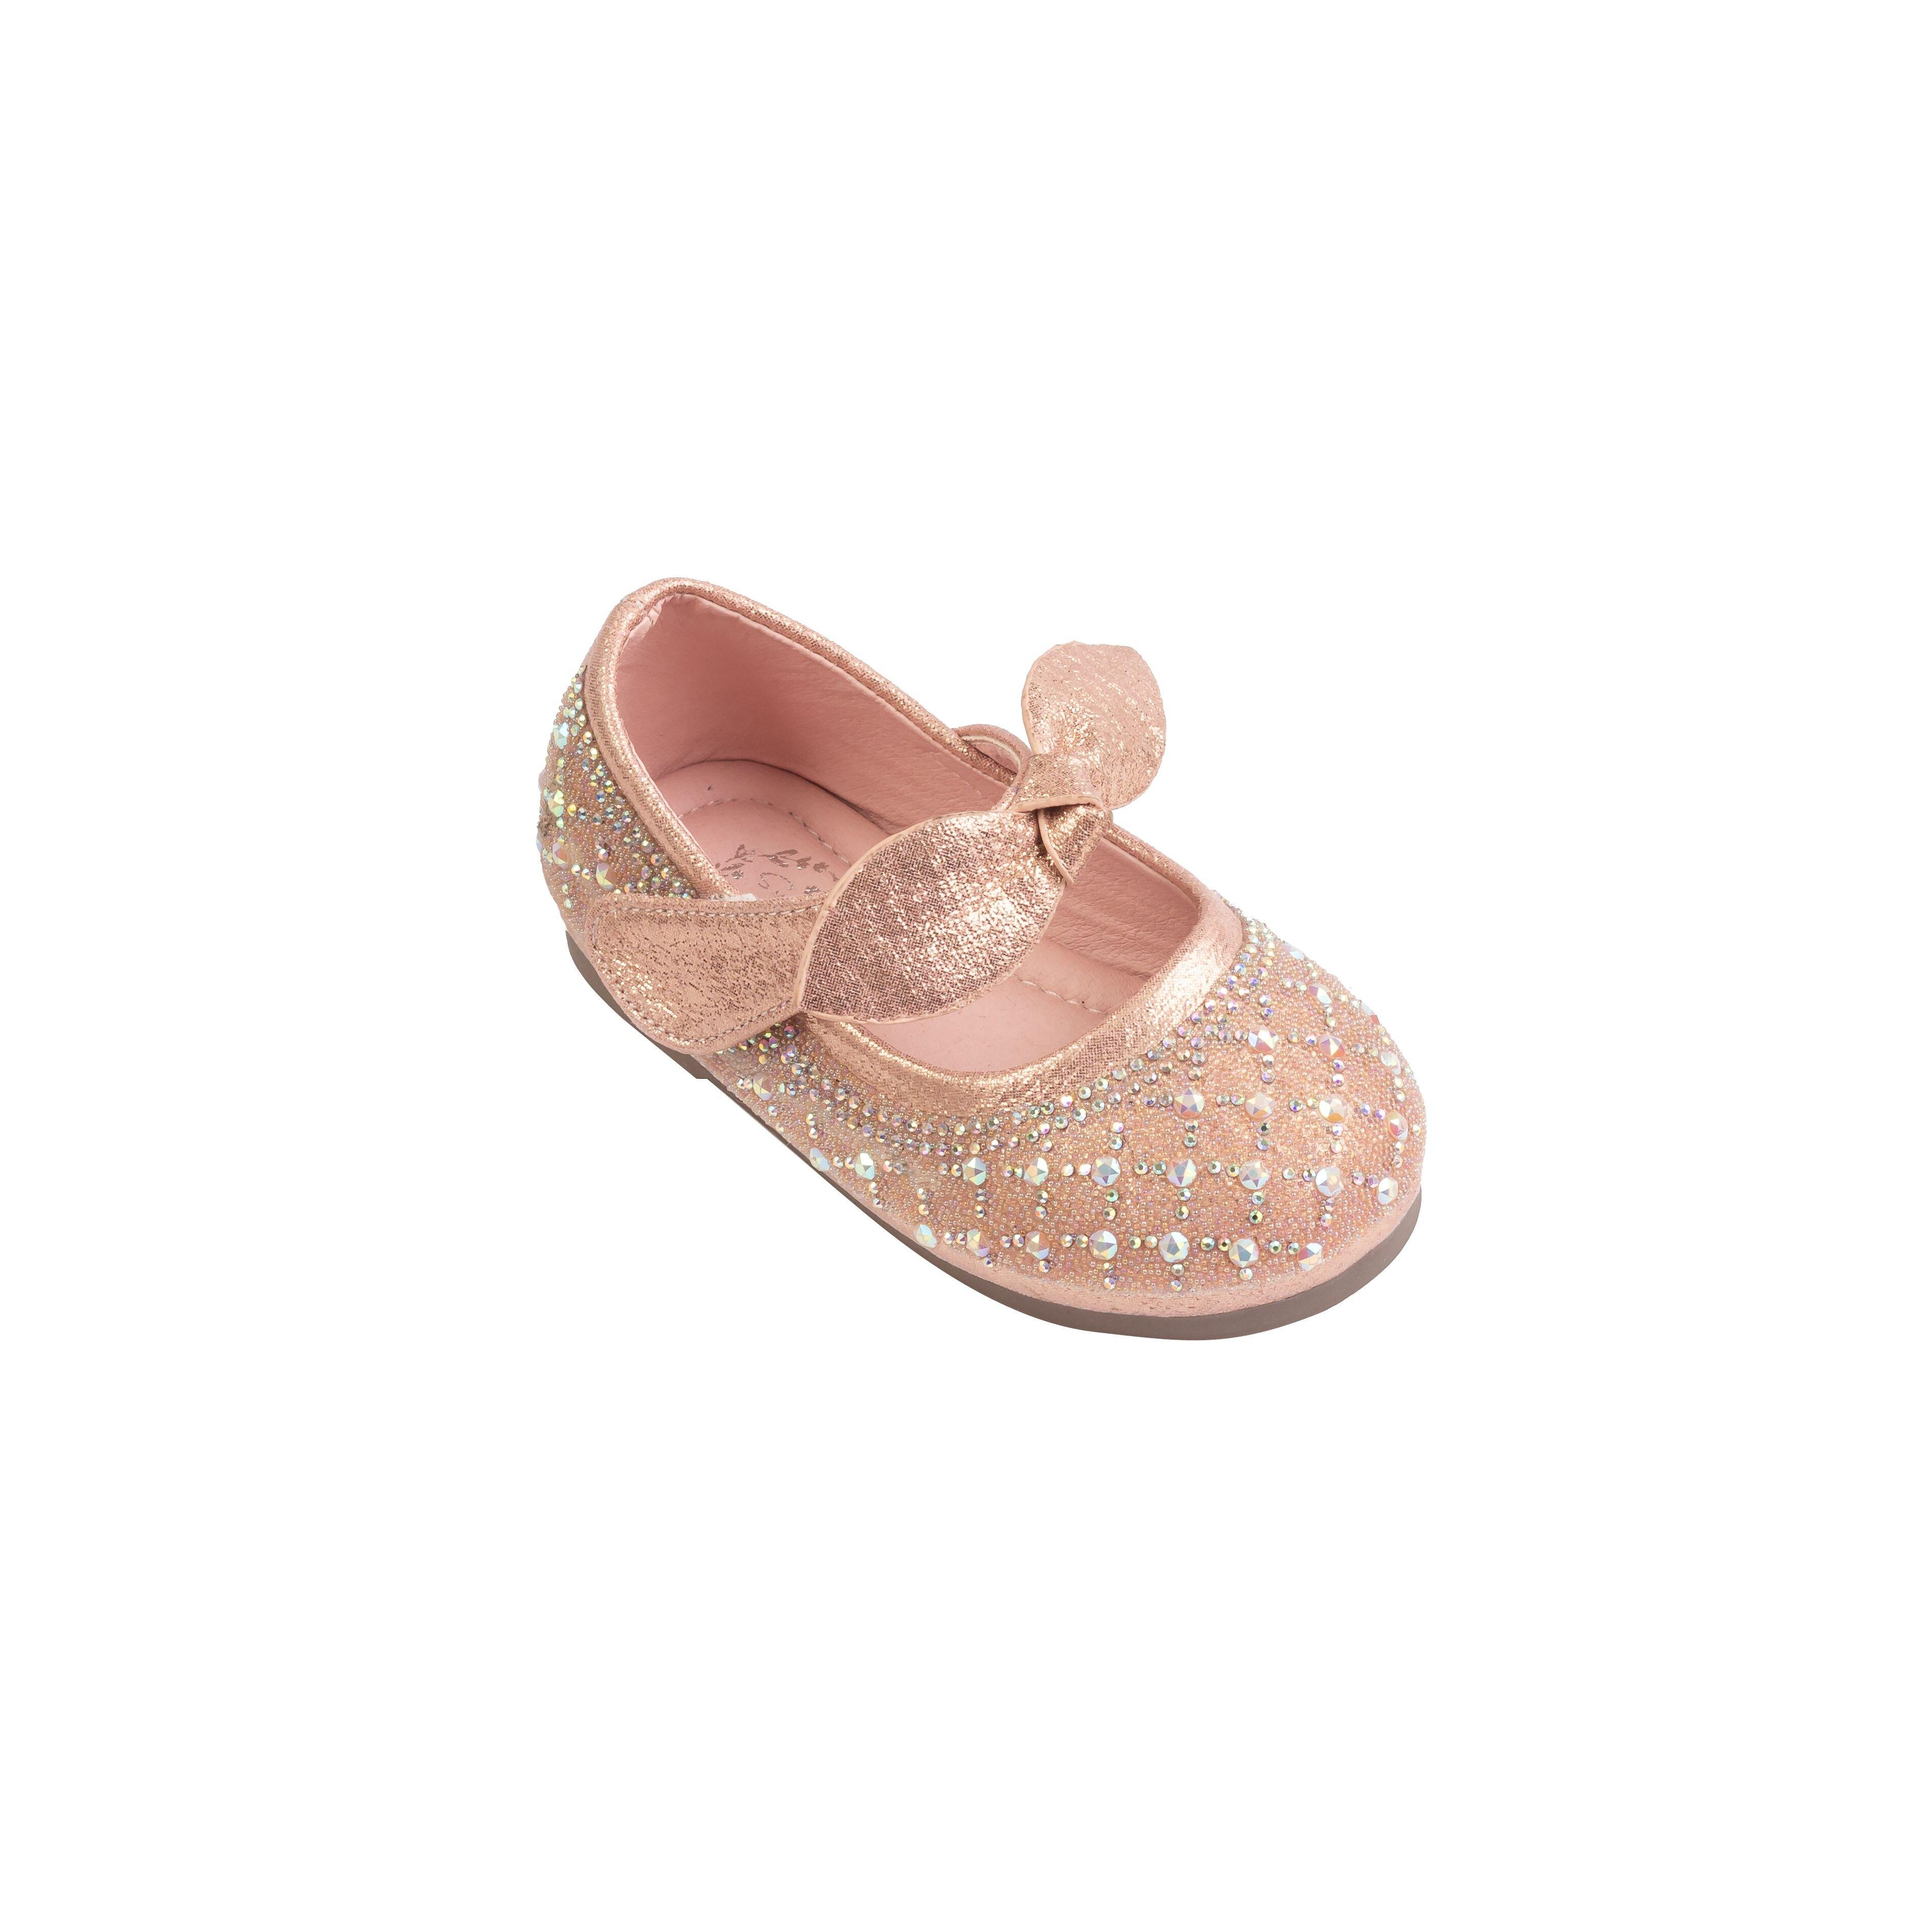 HABU哈布童鞋 粉色芭蕾鑲鑽娃娃鞋MM73-PI